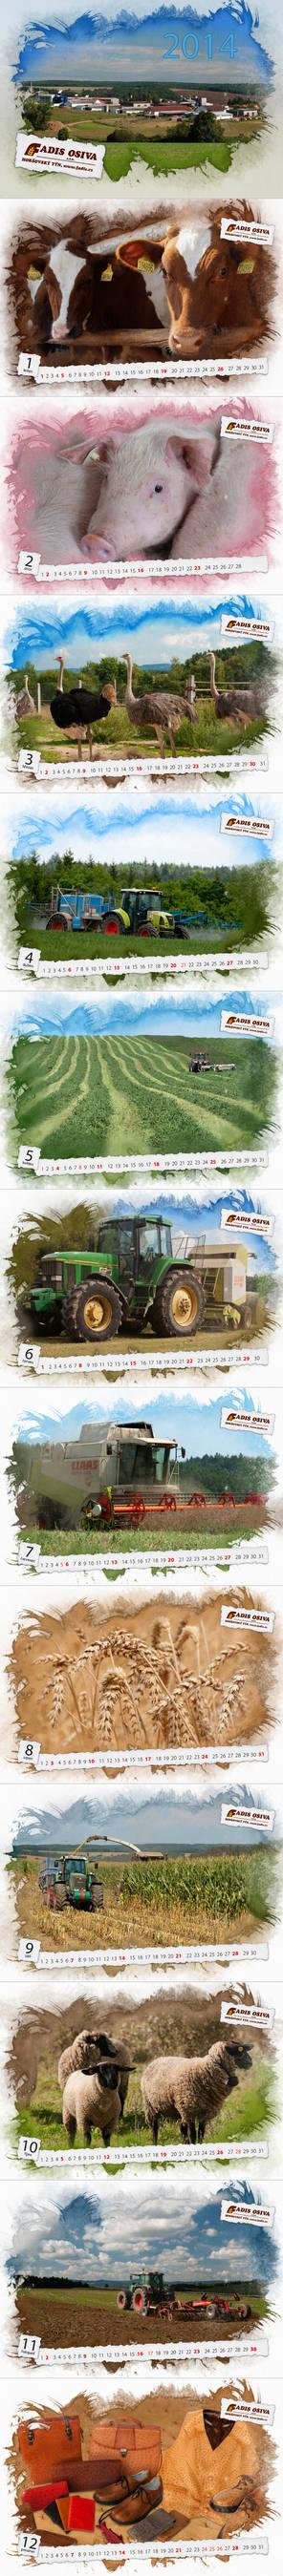 Wall calendar for Fadis Osiva